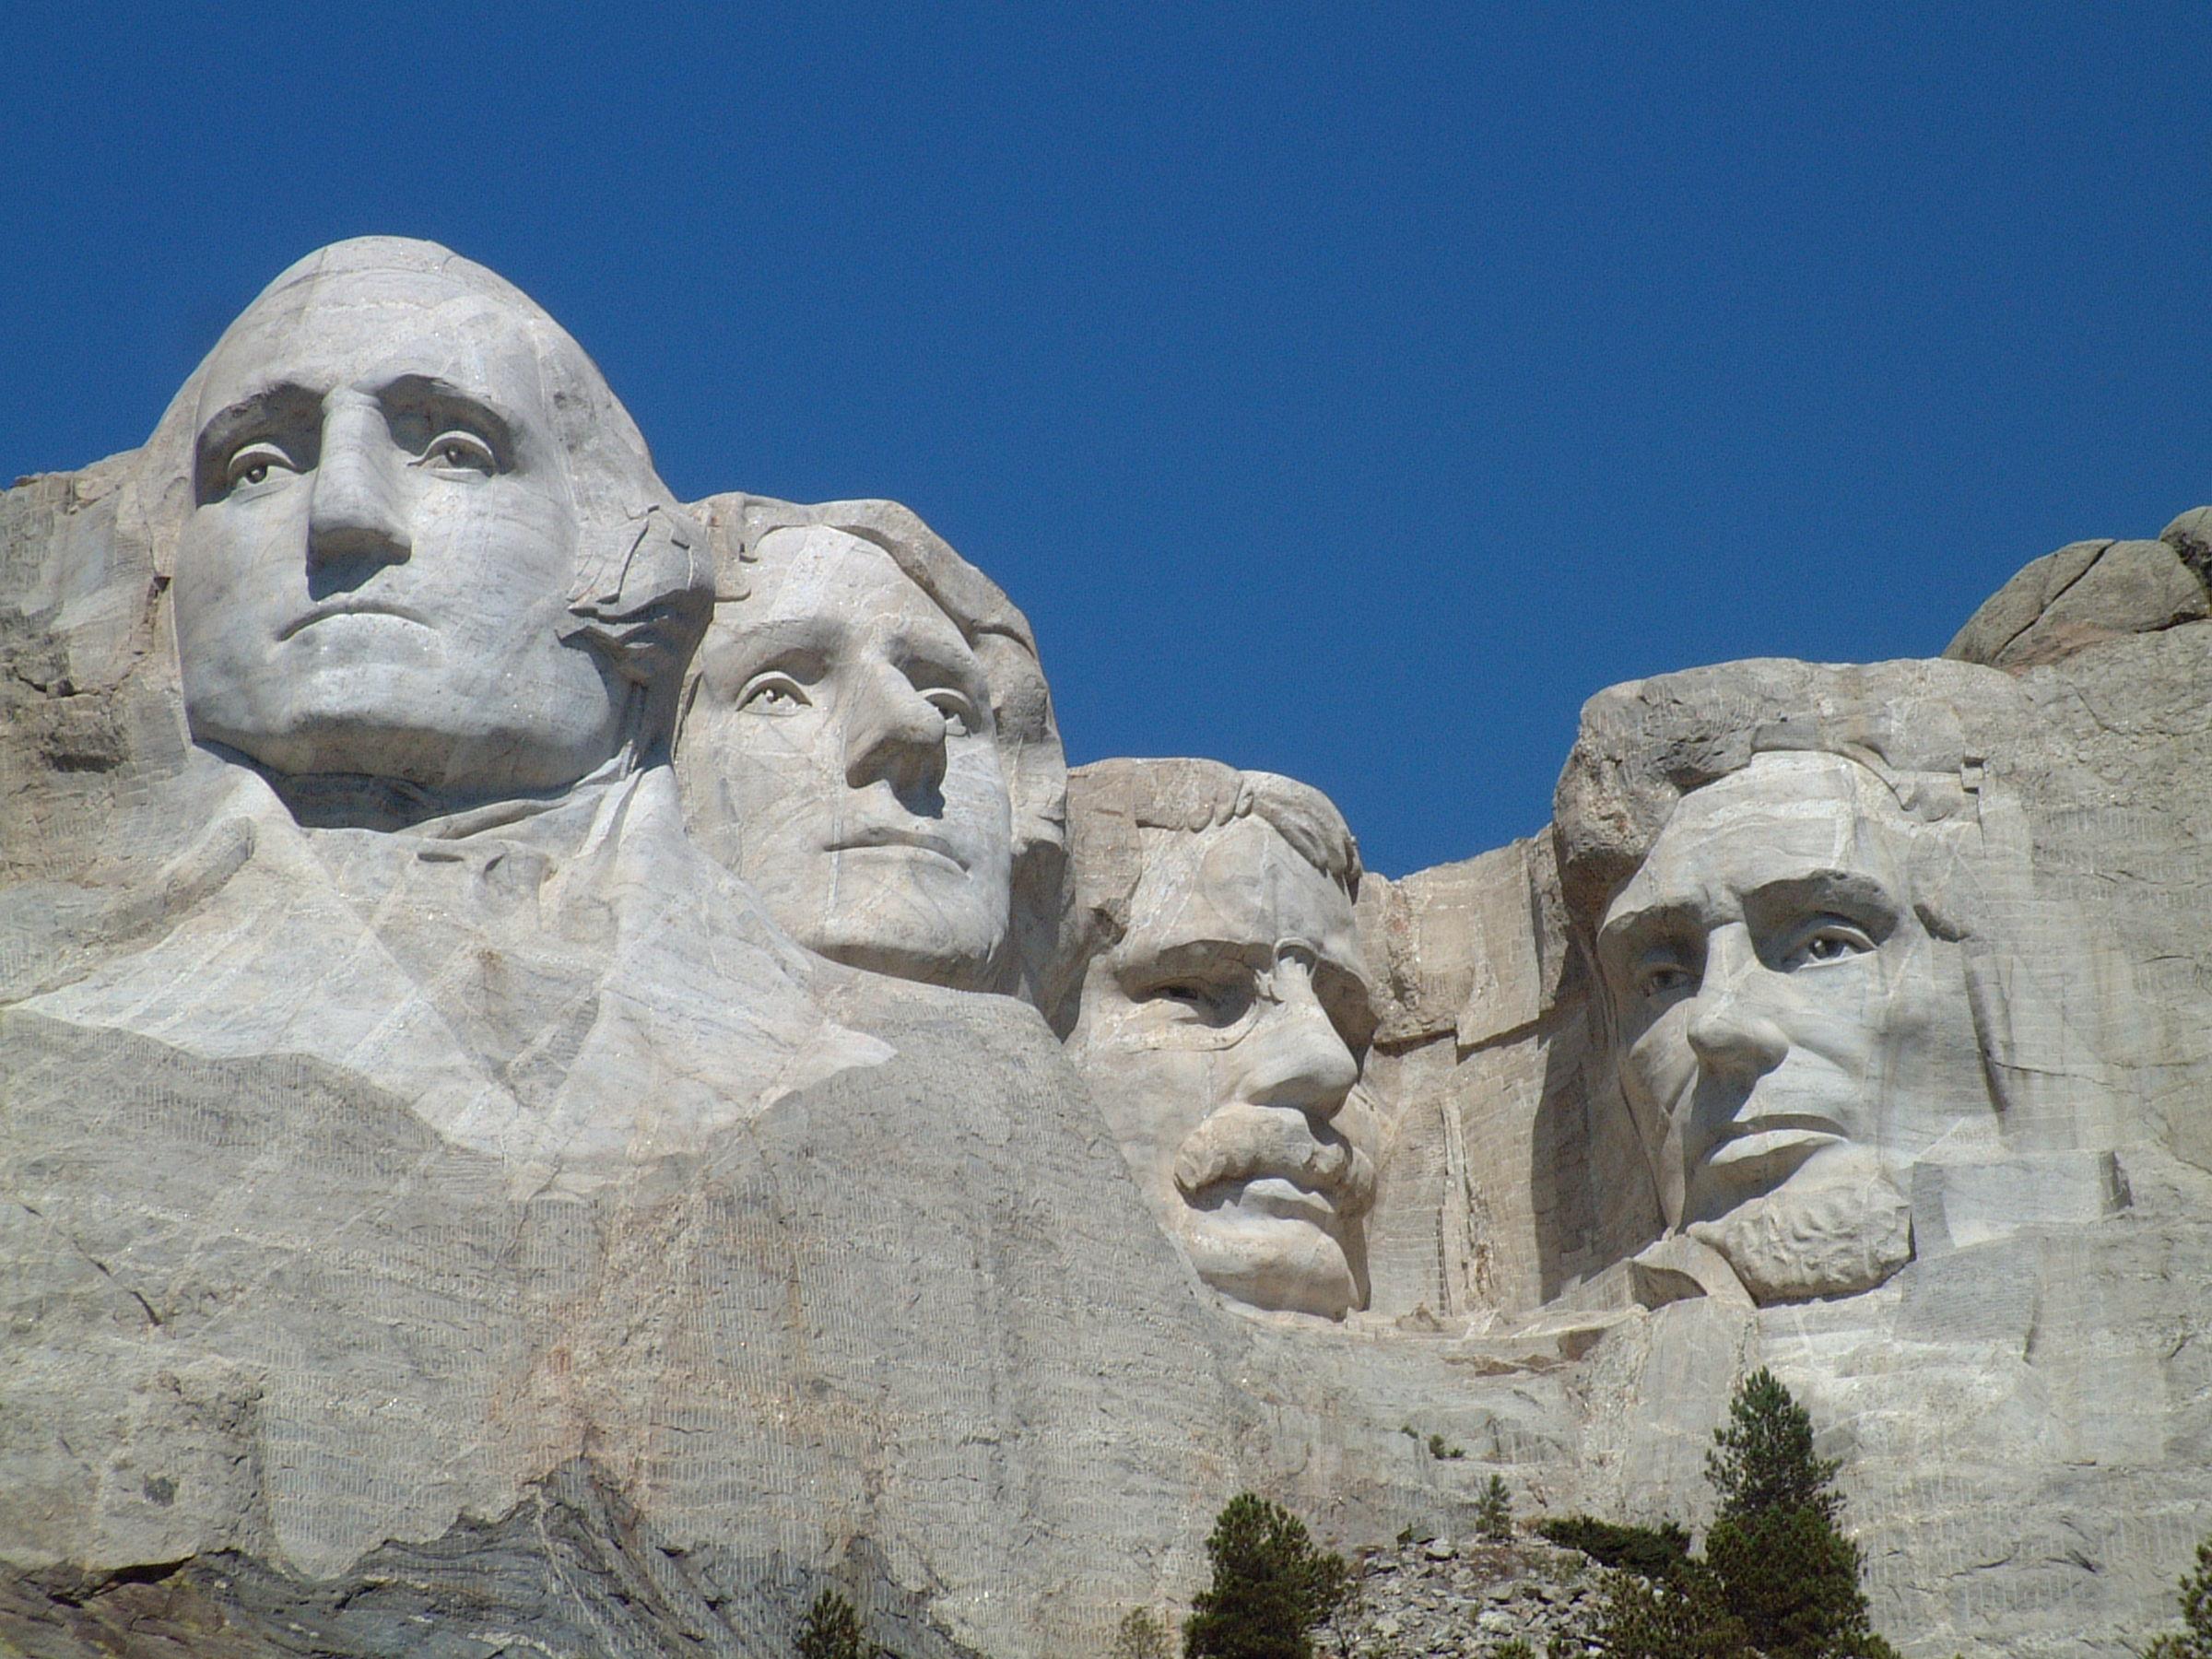 https://i1.wp.com/upload.wikimedia.org/wikipedia/commons/1/10/Mount_Rushmore_National_Memorial.jpg